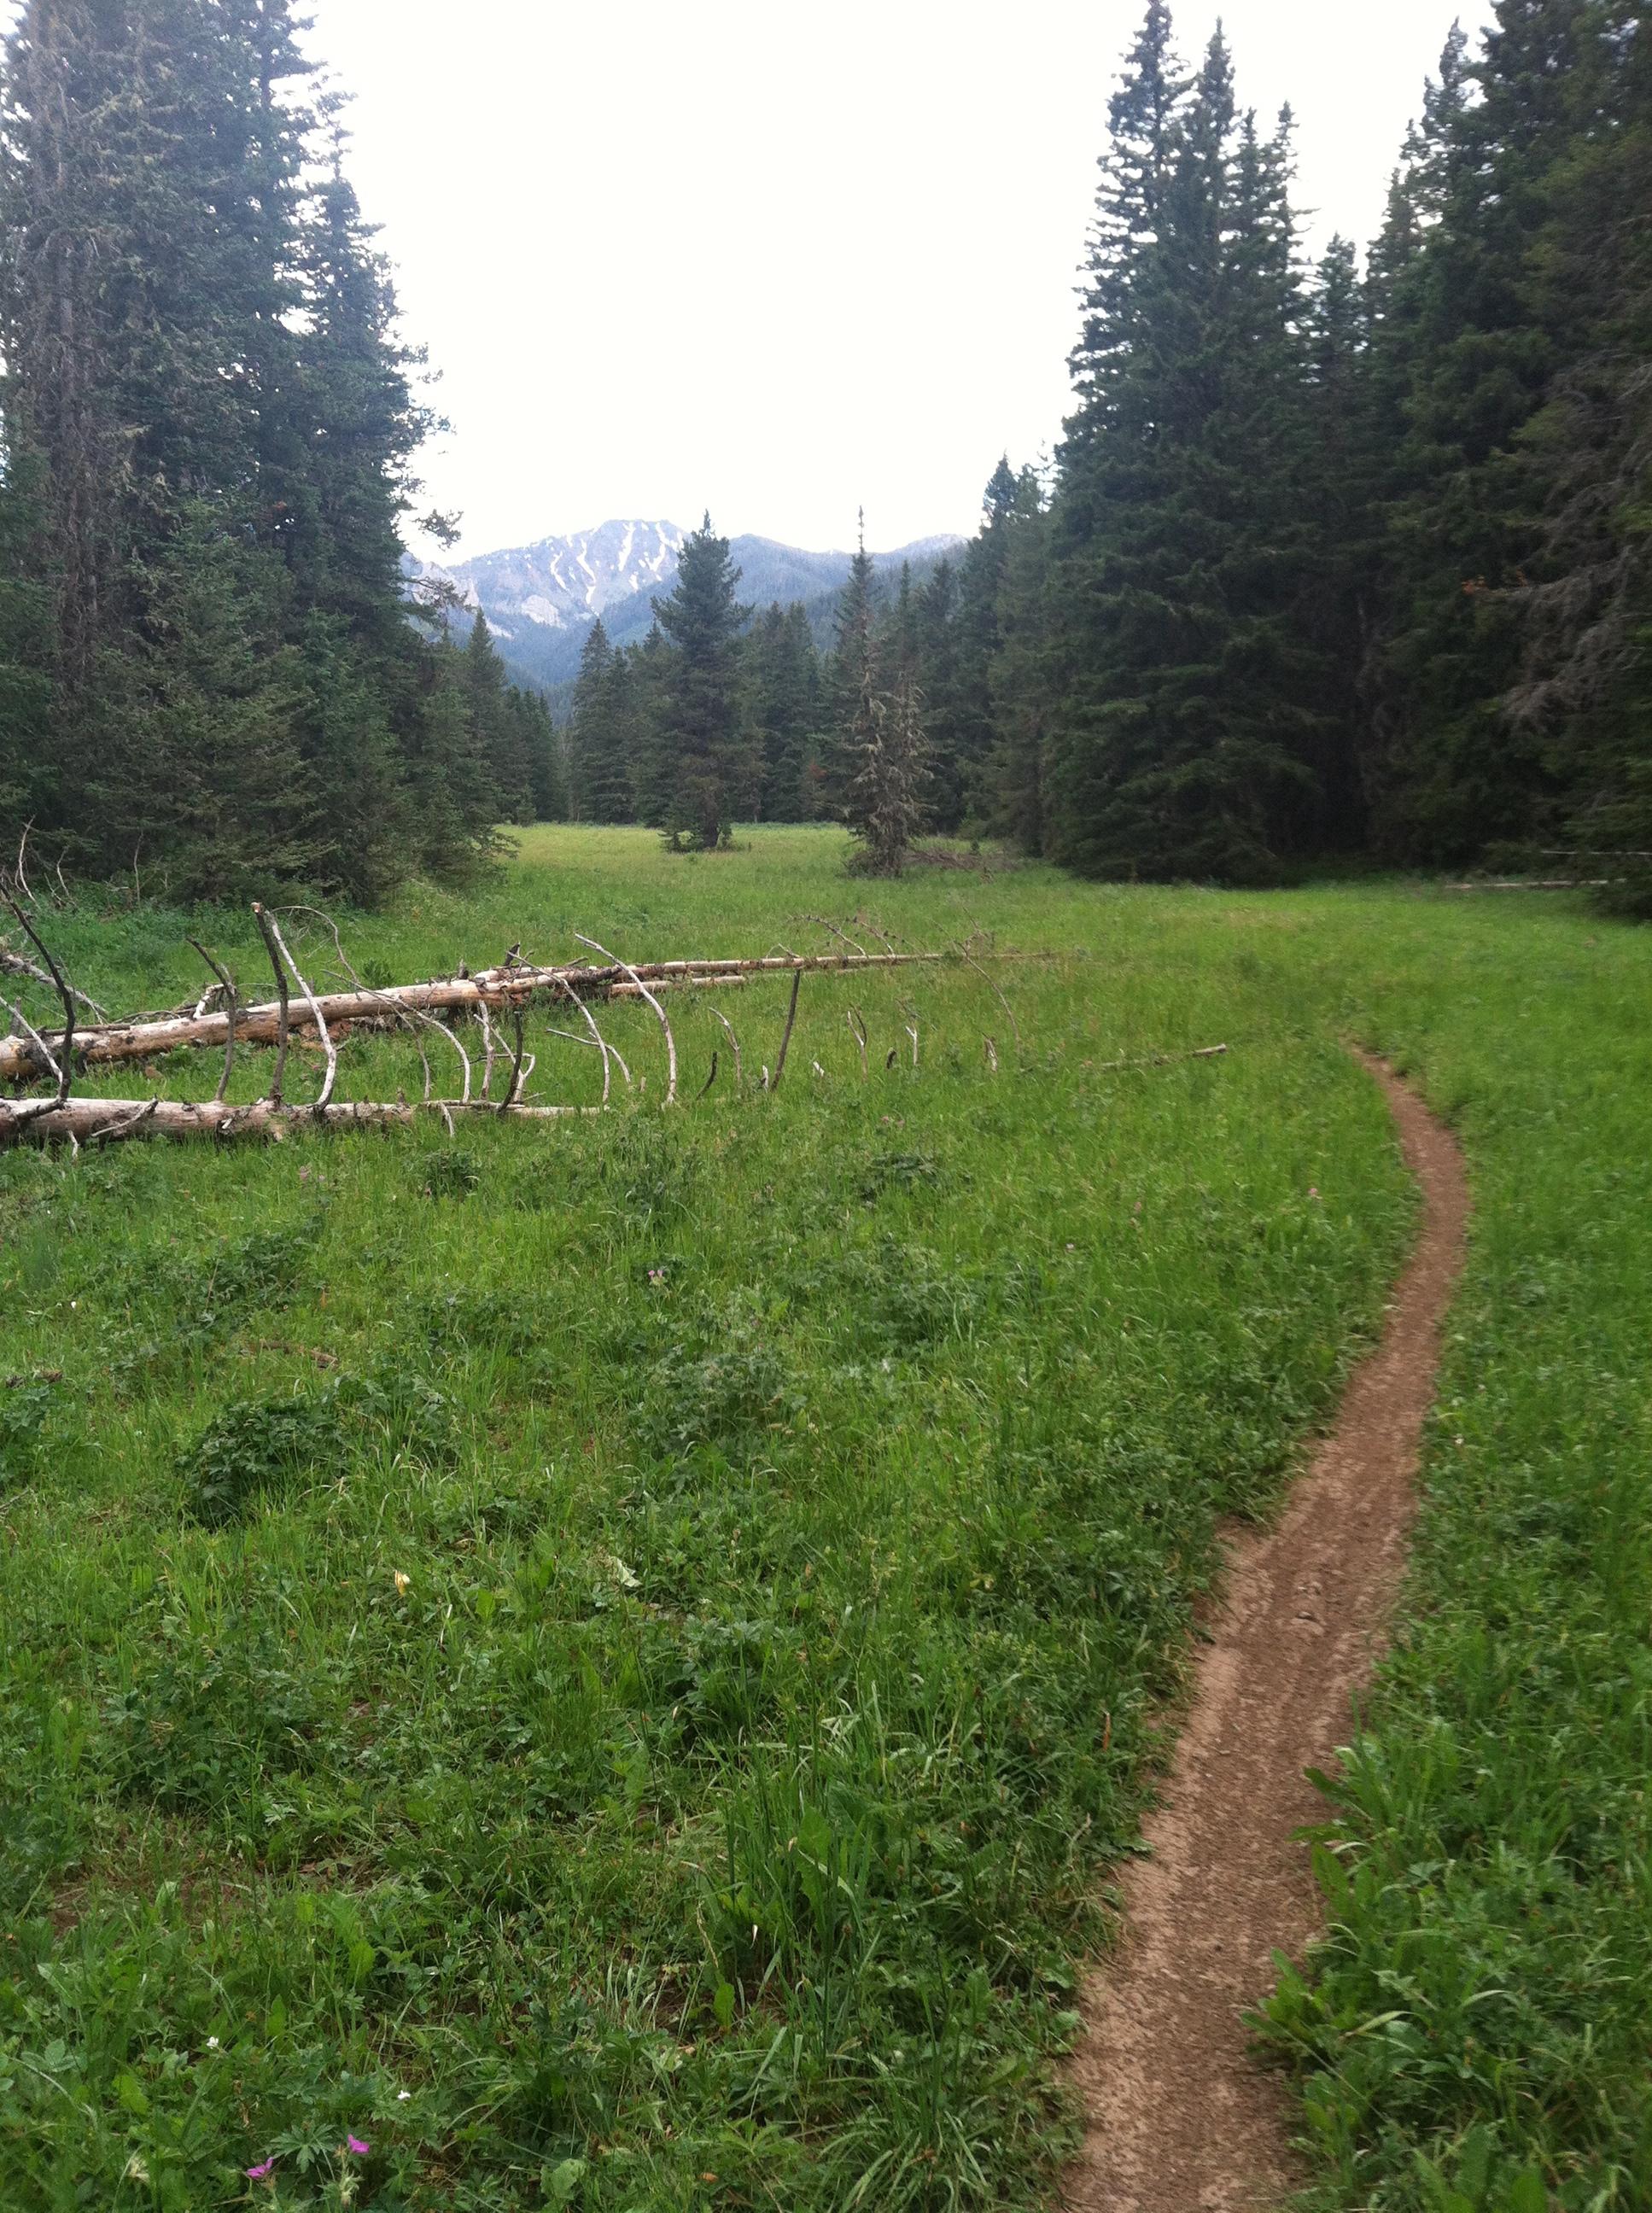 Montana singletrack